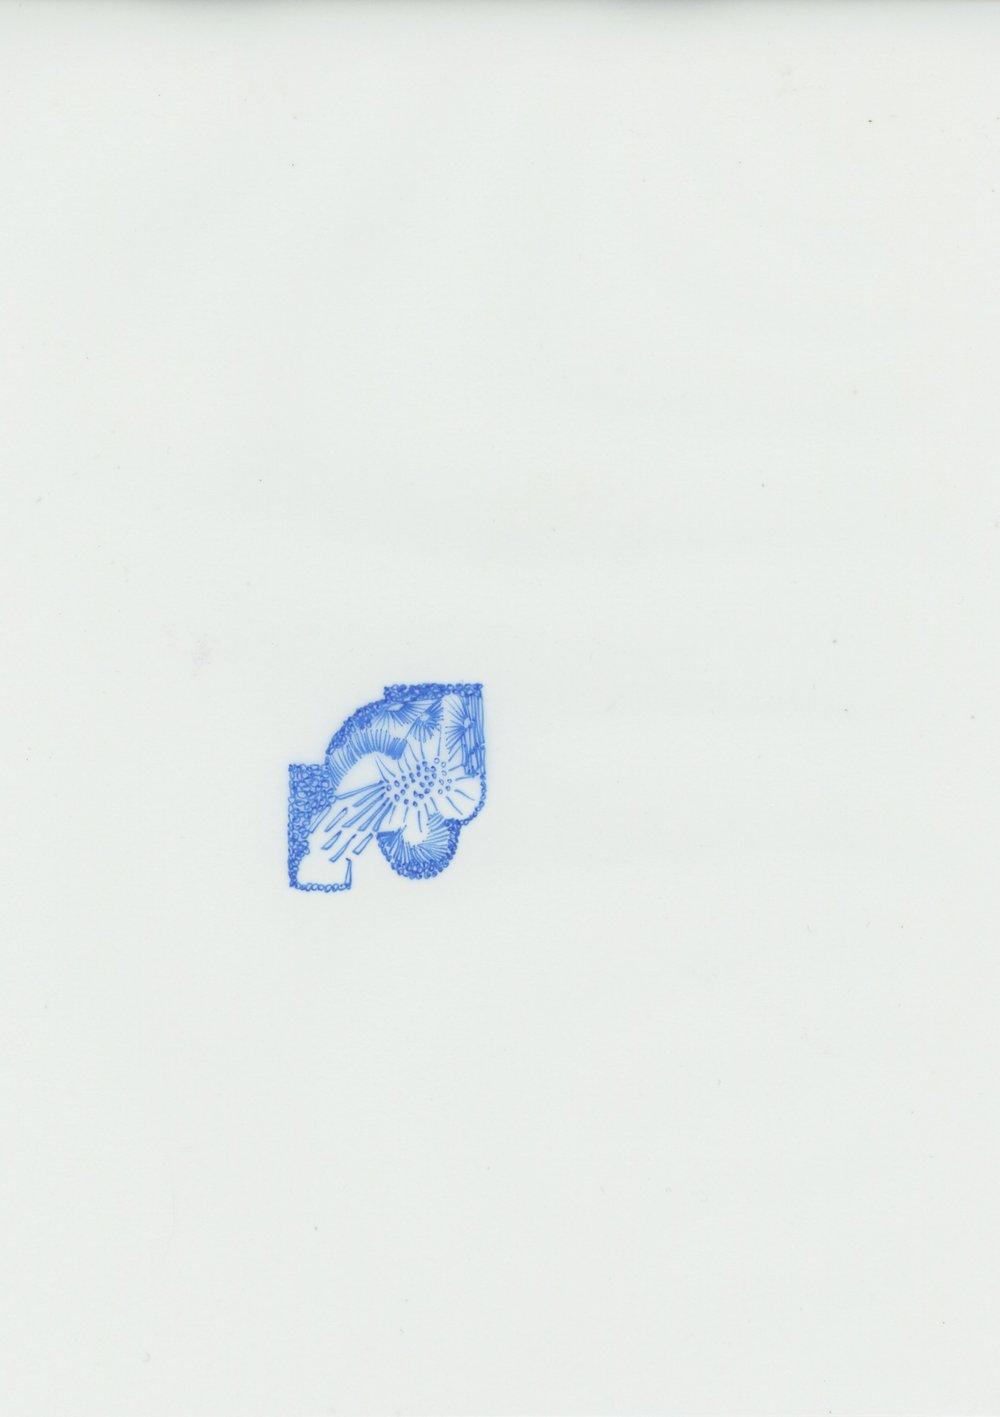 012119.18.Perfume.jpg